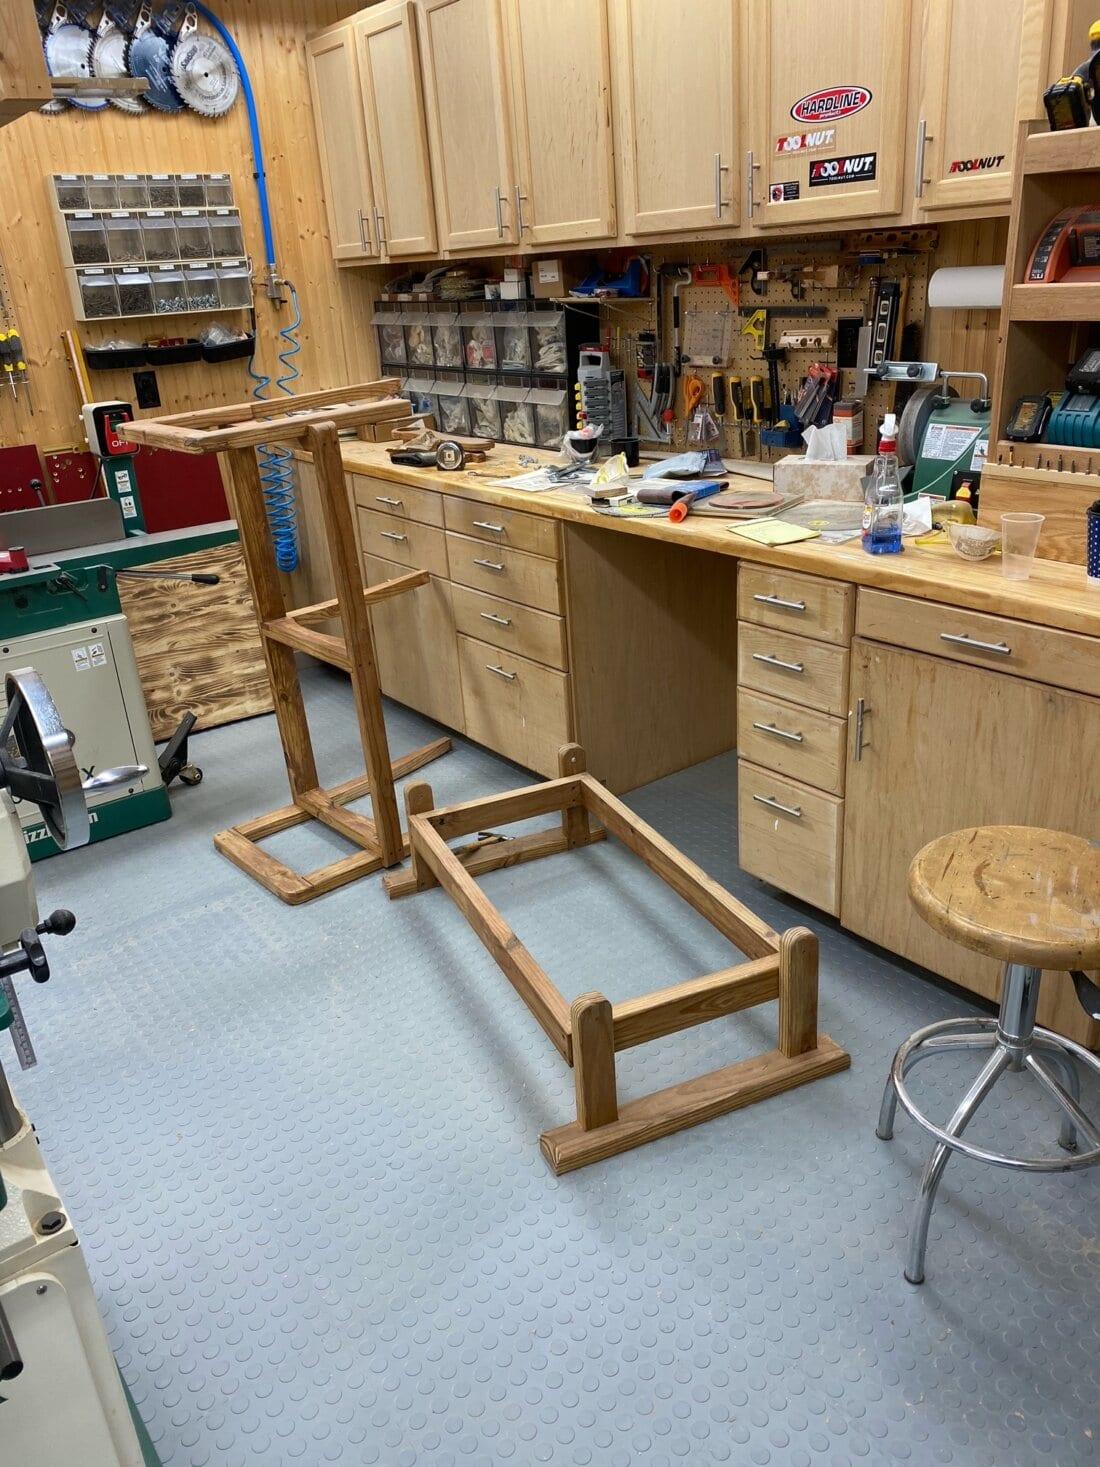 Workshop with flexible tiles